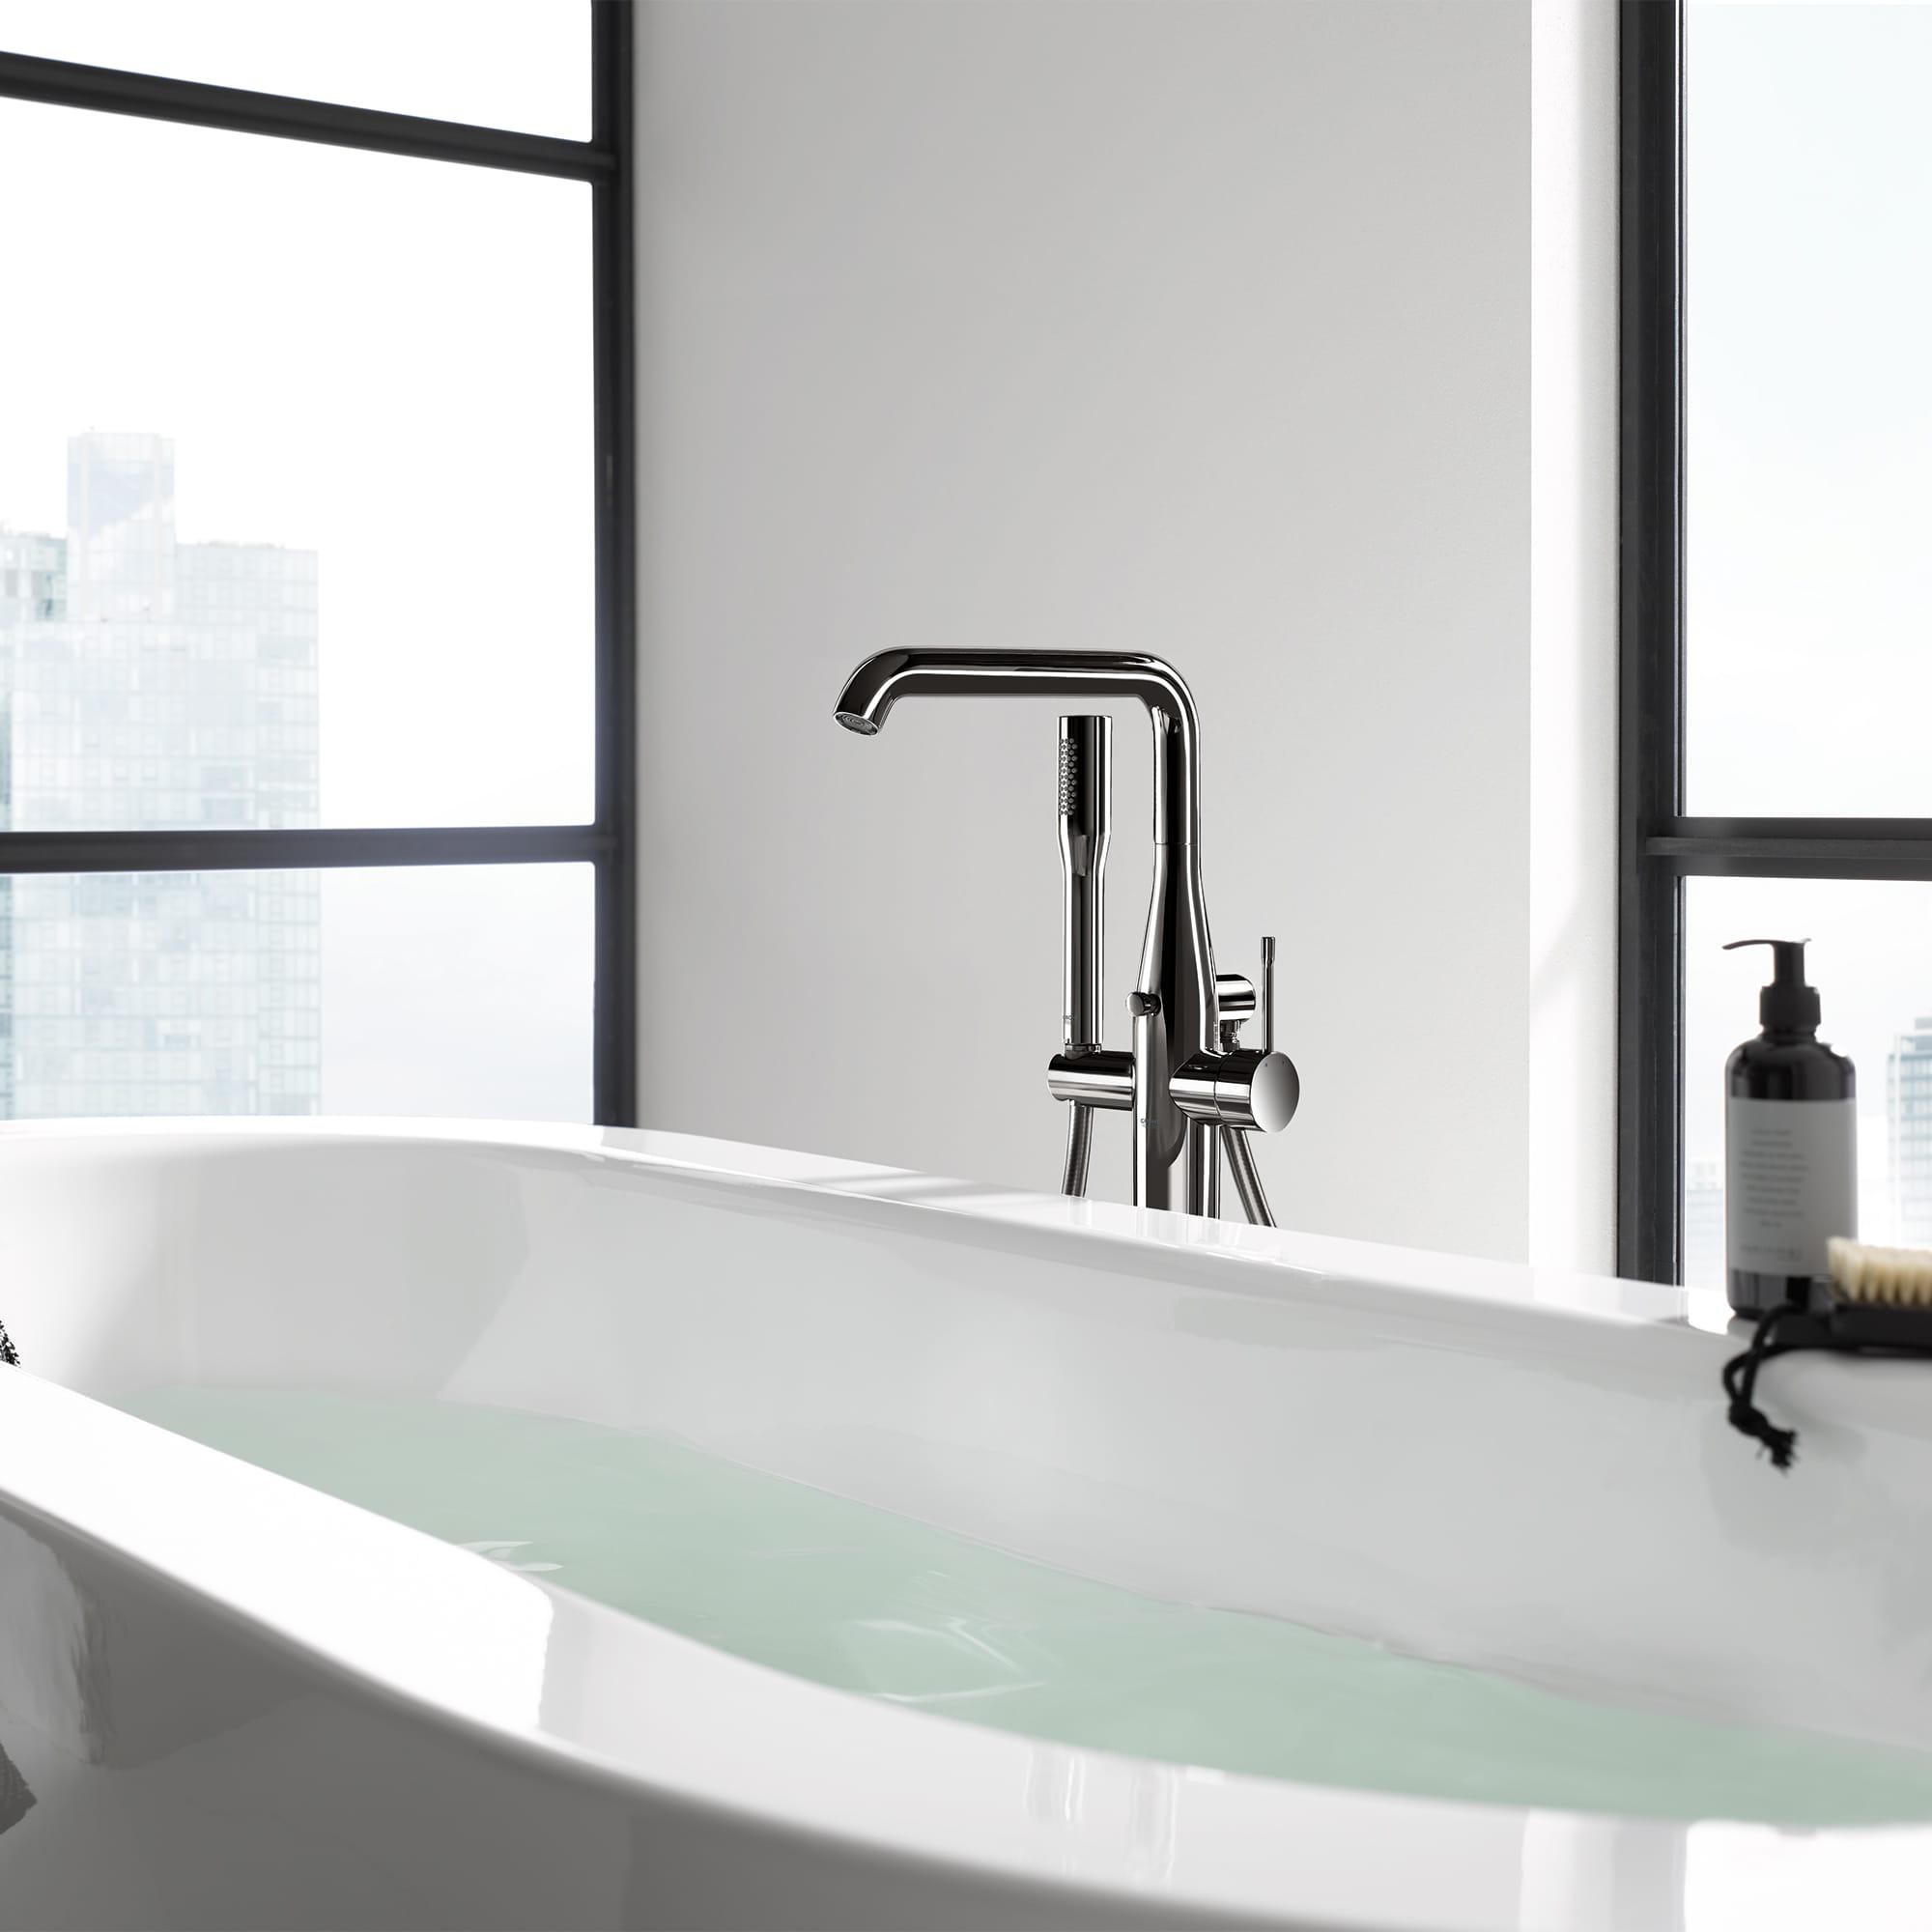 Essence robinet de baignoire